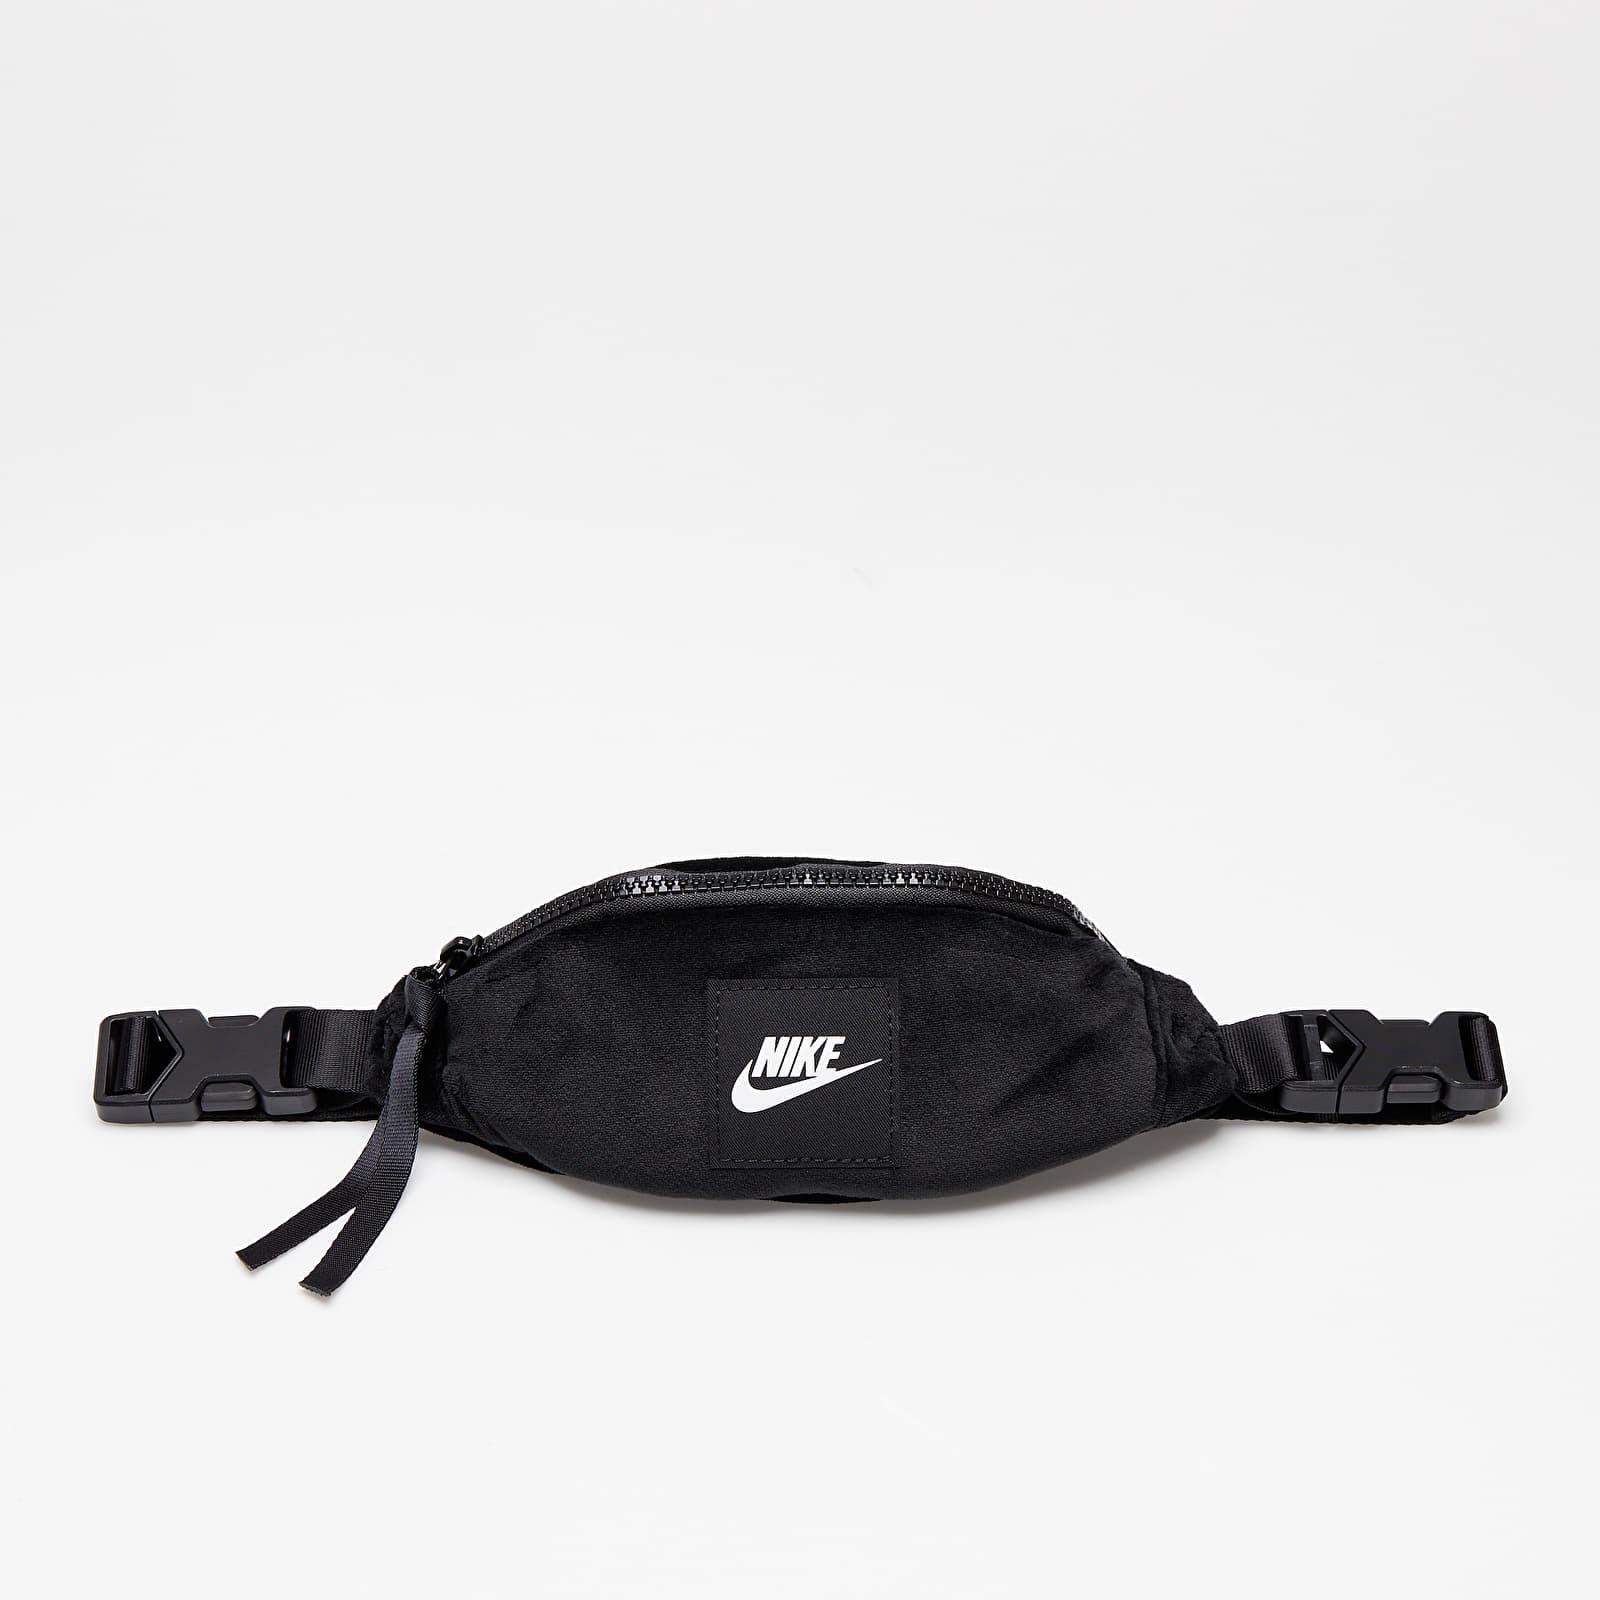 Nike Heritage Backpack - Winterized Black/ Black/ White EUR